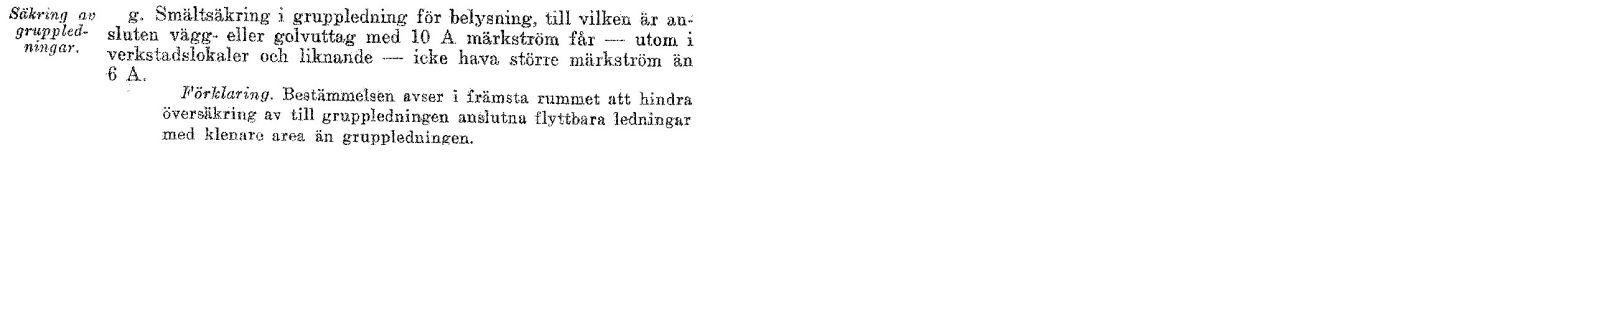 Paragraf35g1939-rsfreskrift.jpg